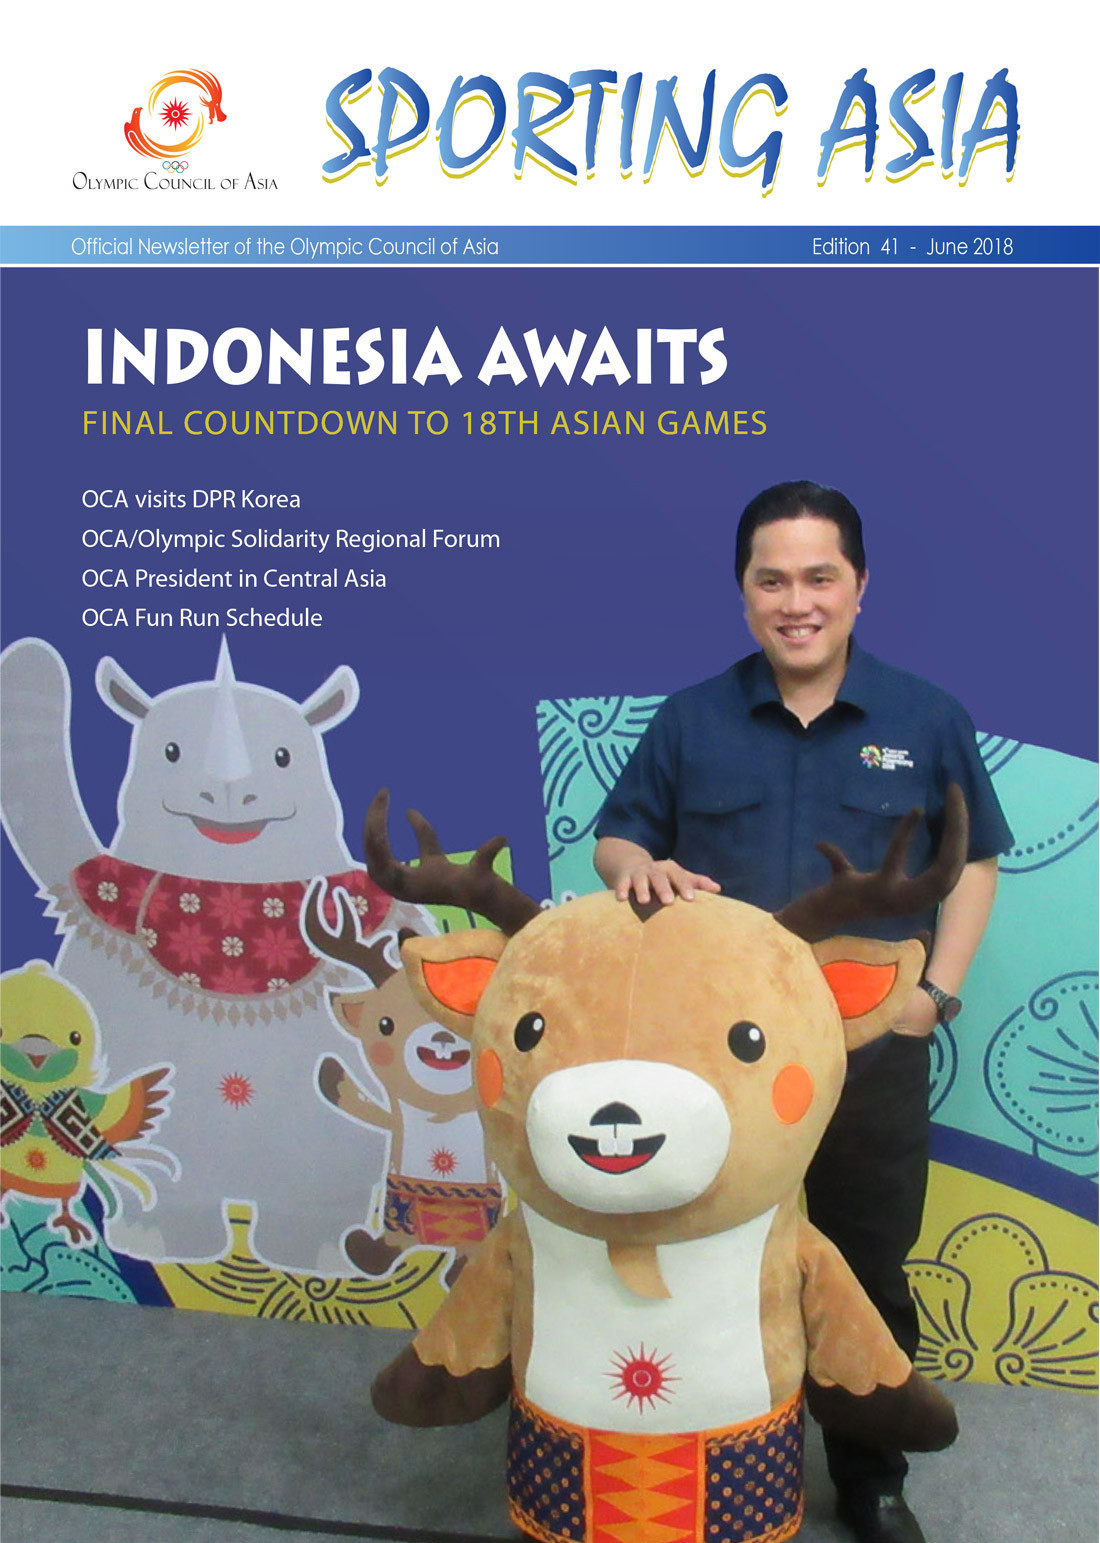 Sporting Asia - Edition 41 - JUN 2018